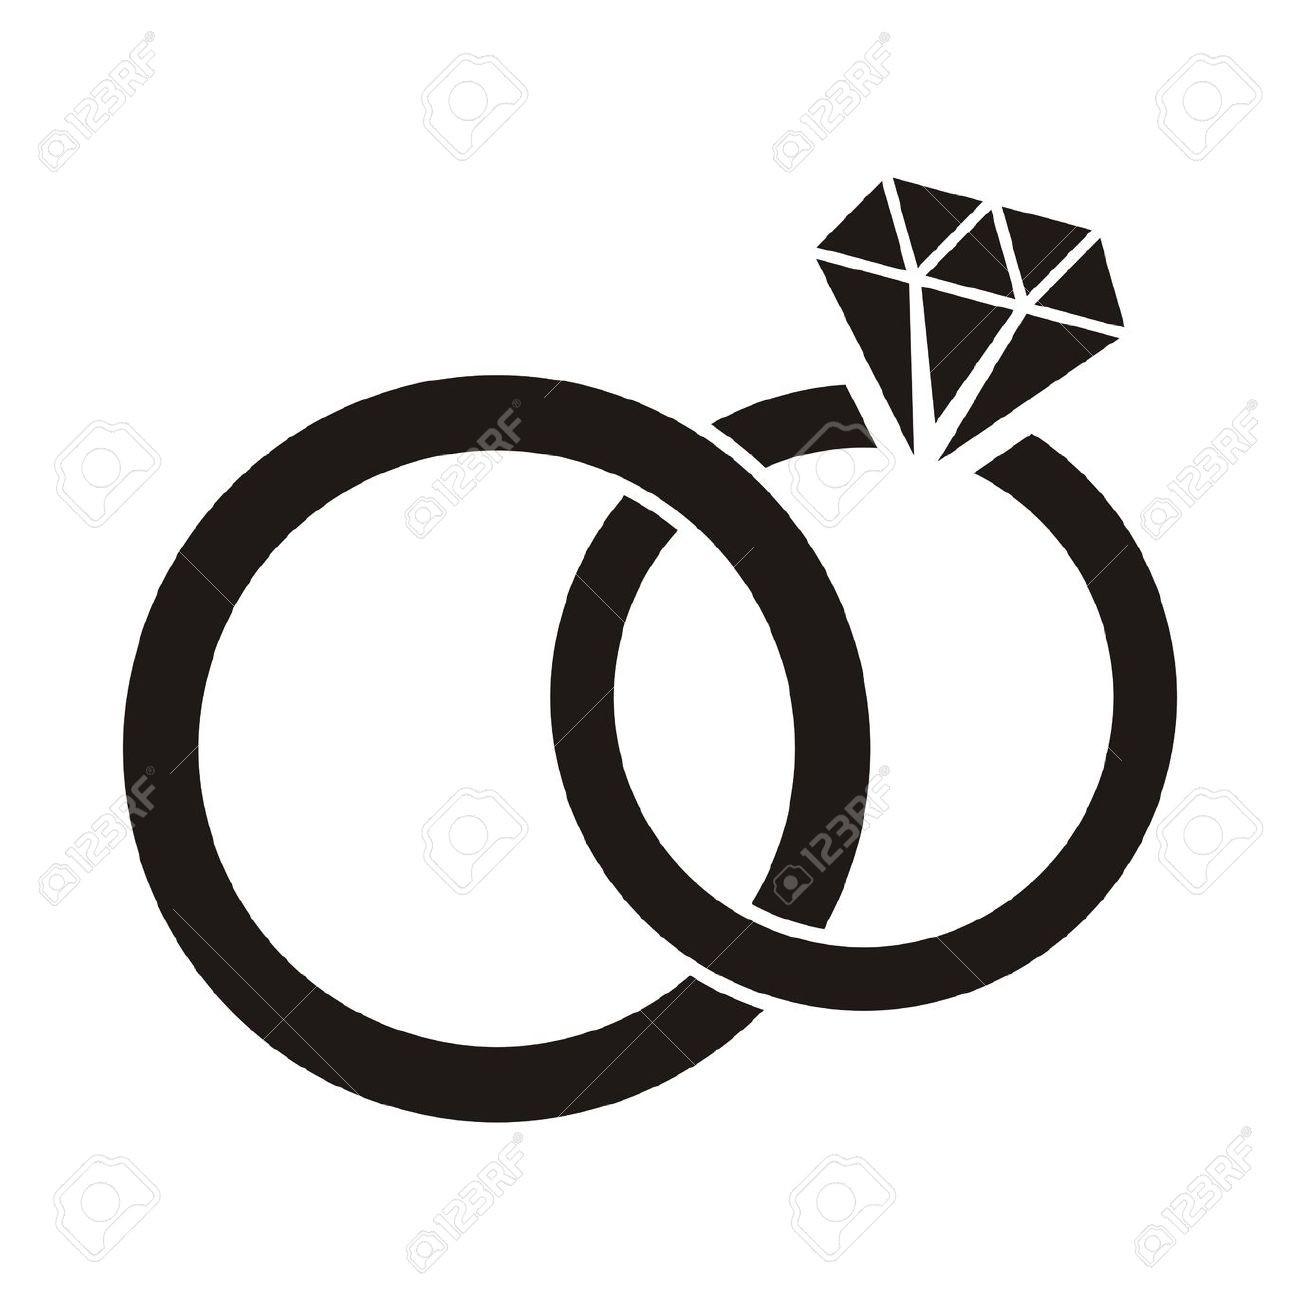 Bridal clipart symbol. Bride silhouette at getdrawings